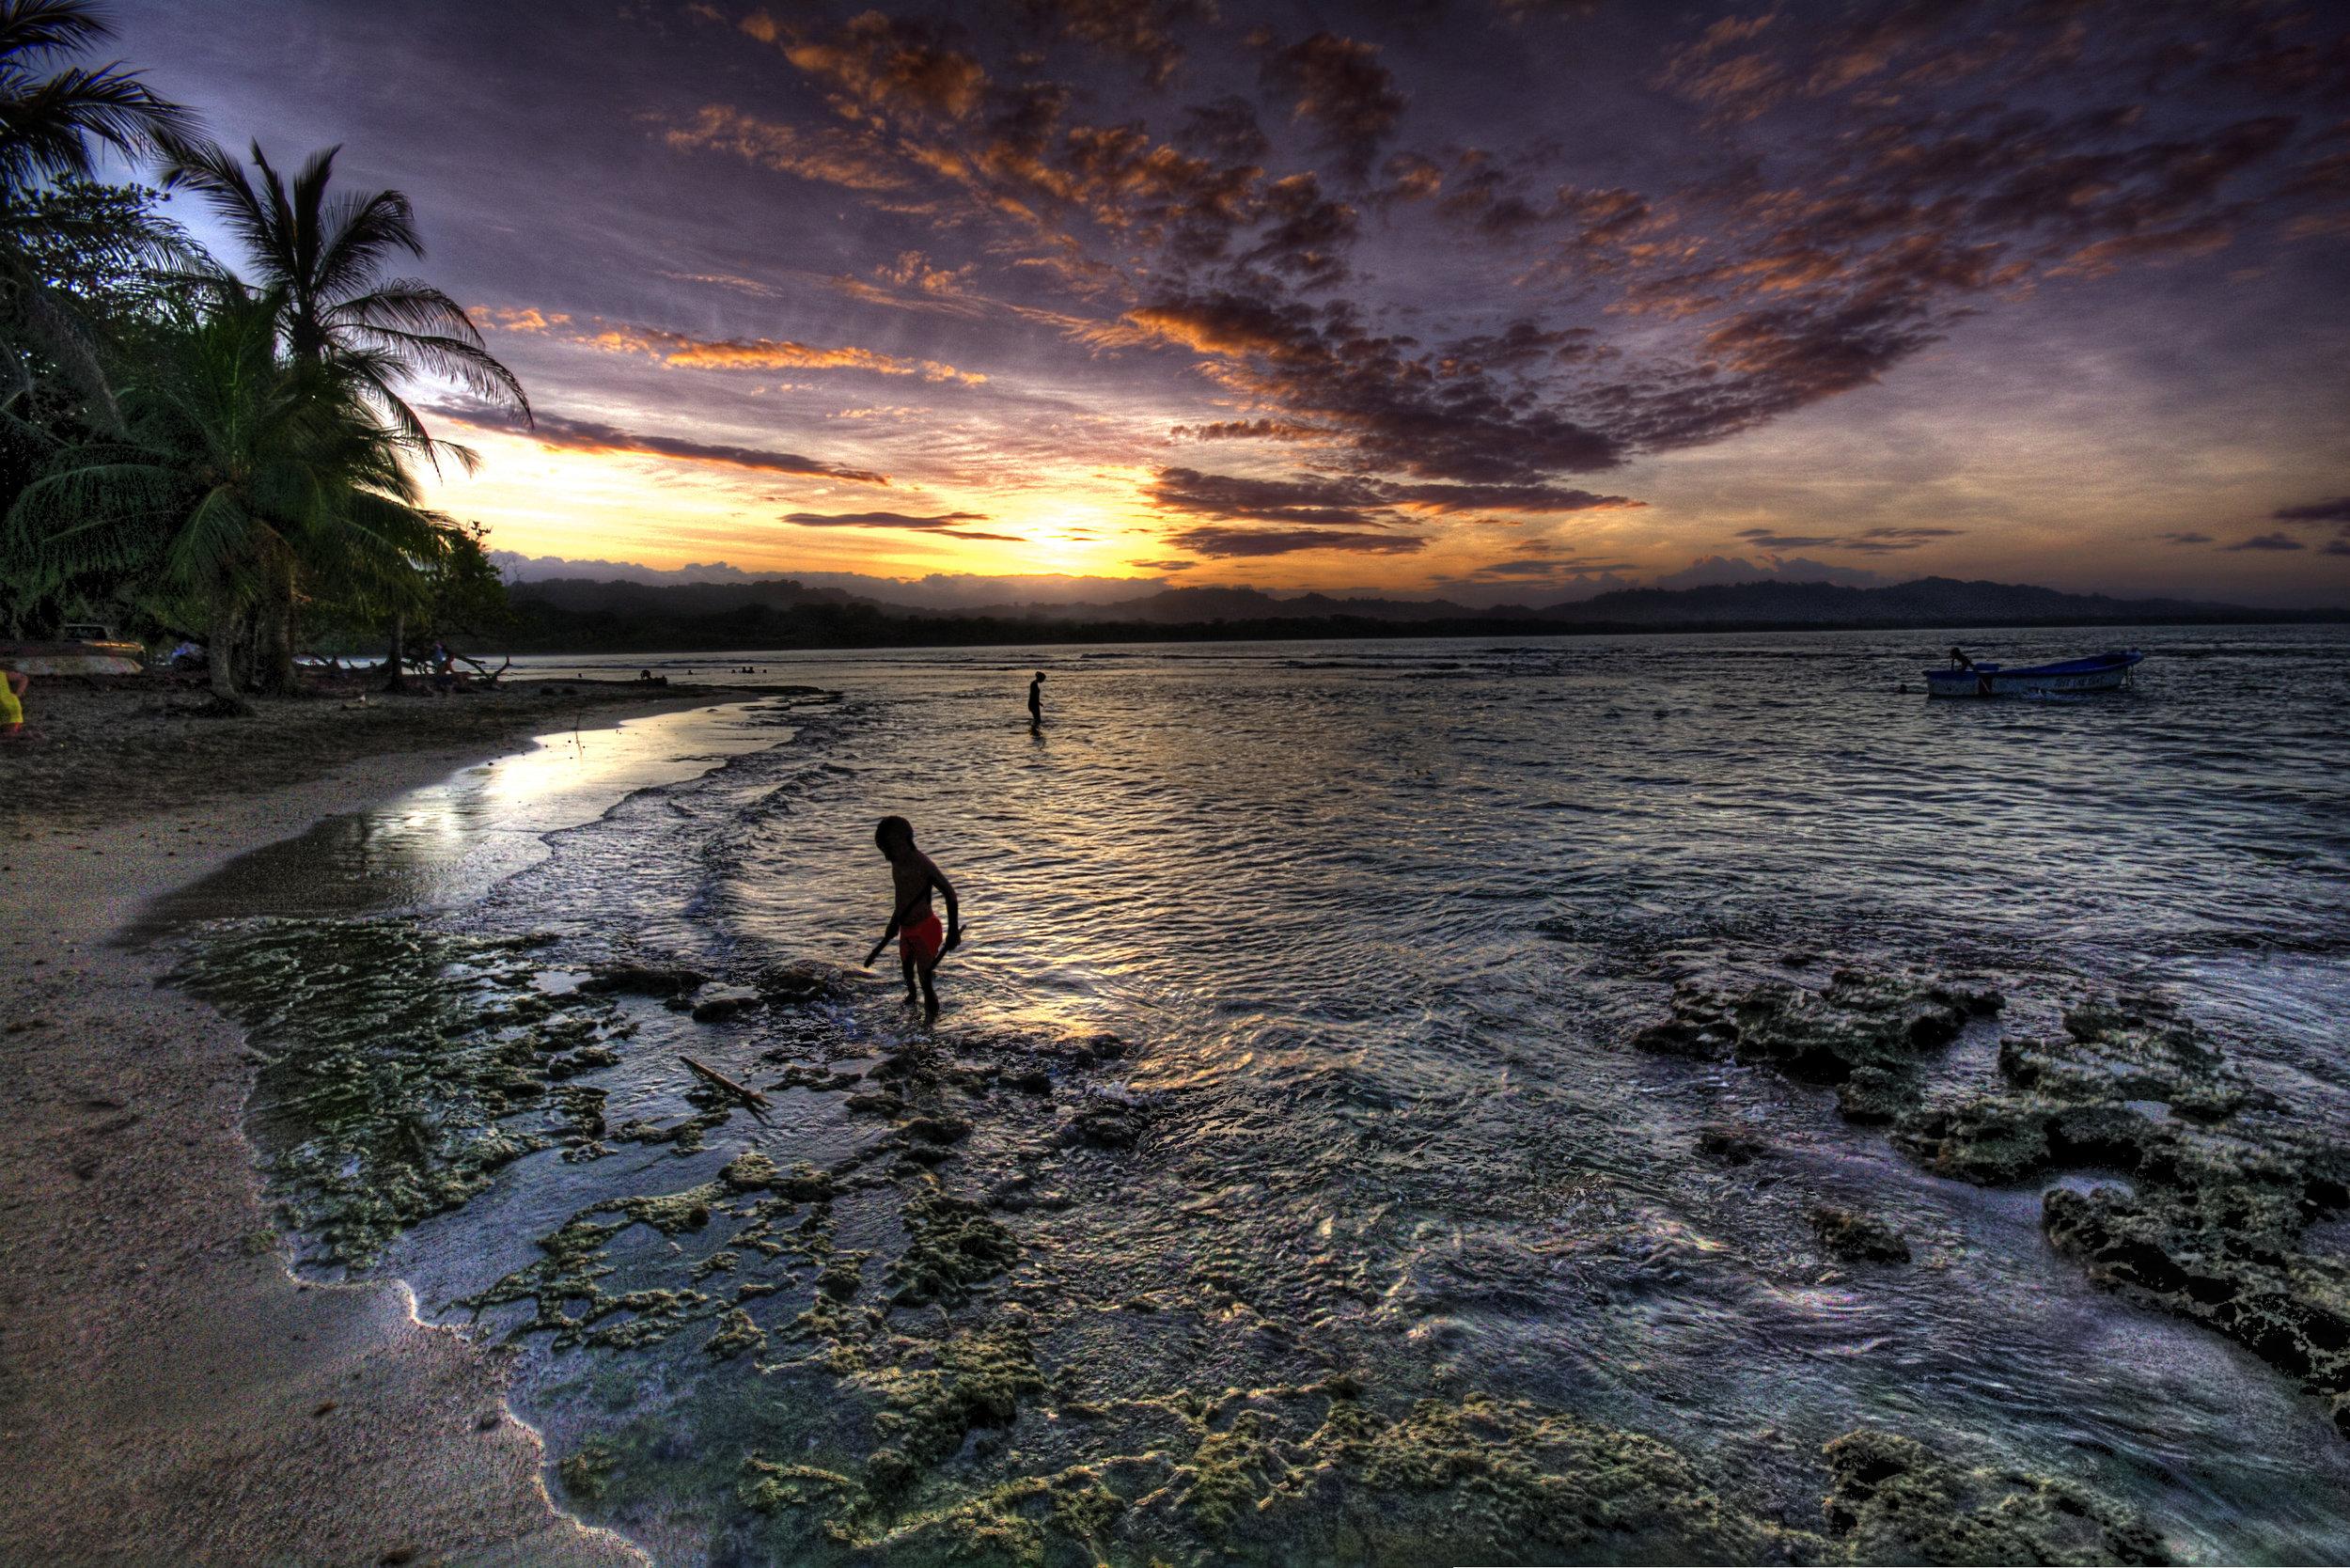 costa-rica-puerto-viejo-beach-6.jpg